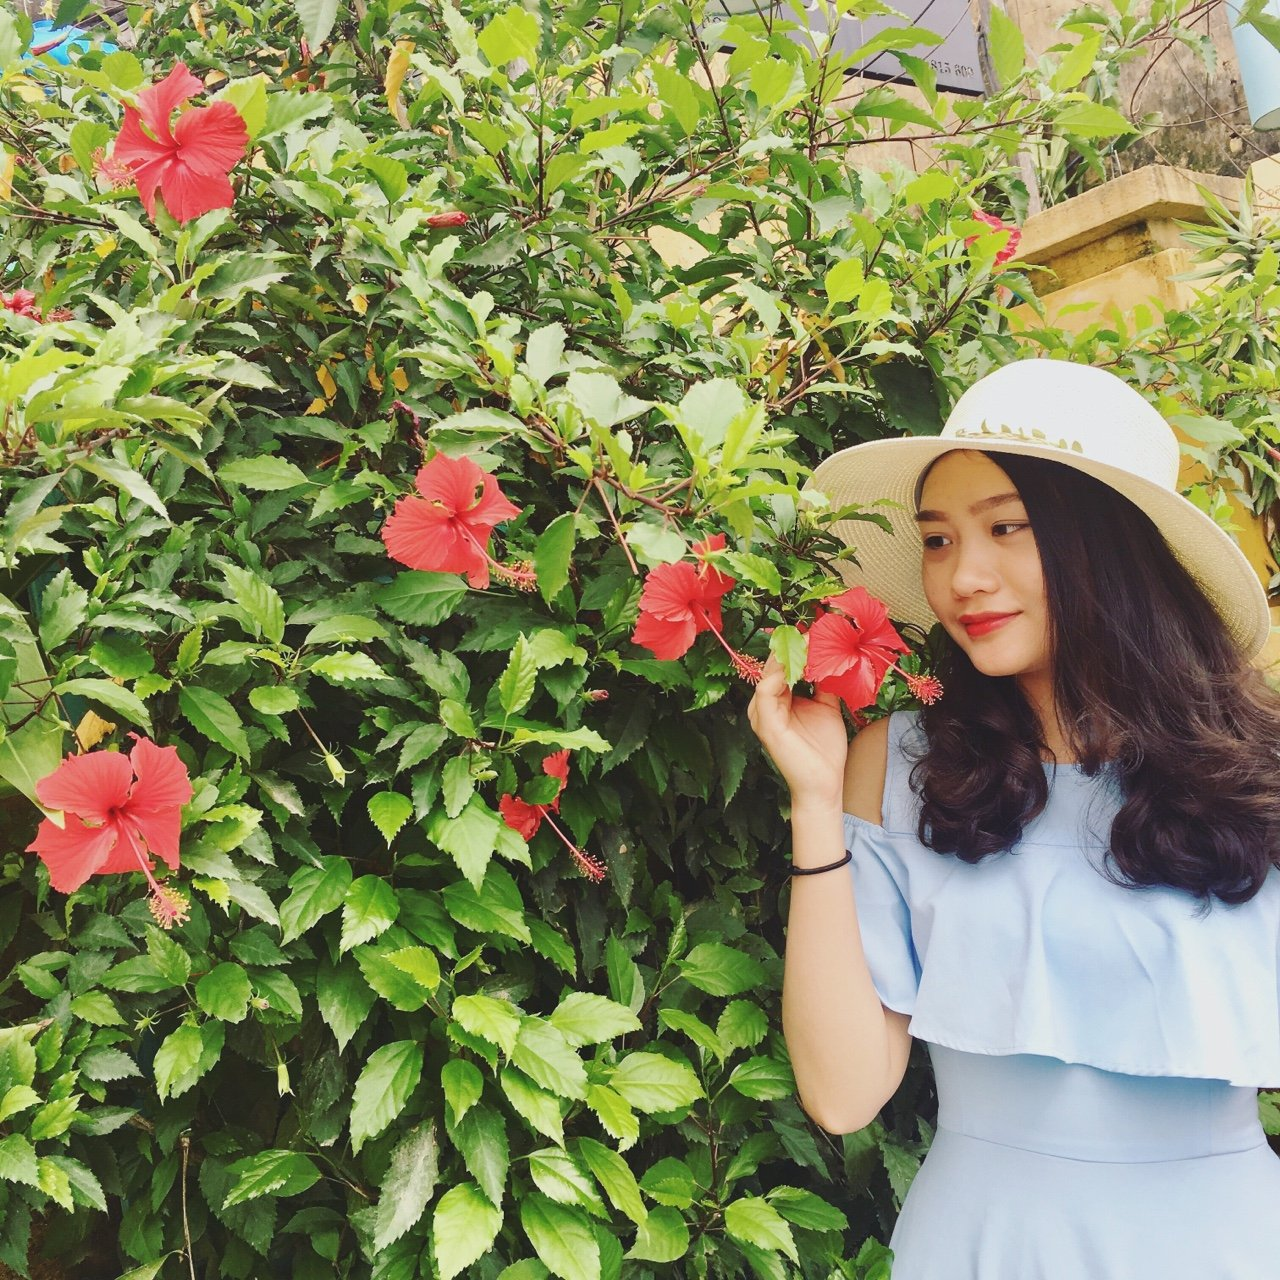 Pham Thi My Linh 5